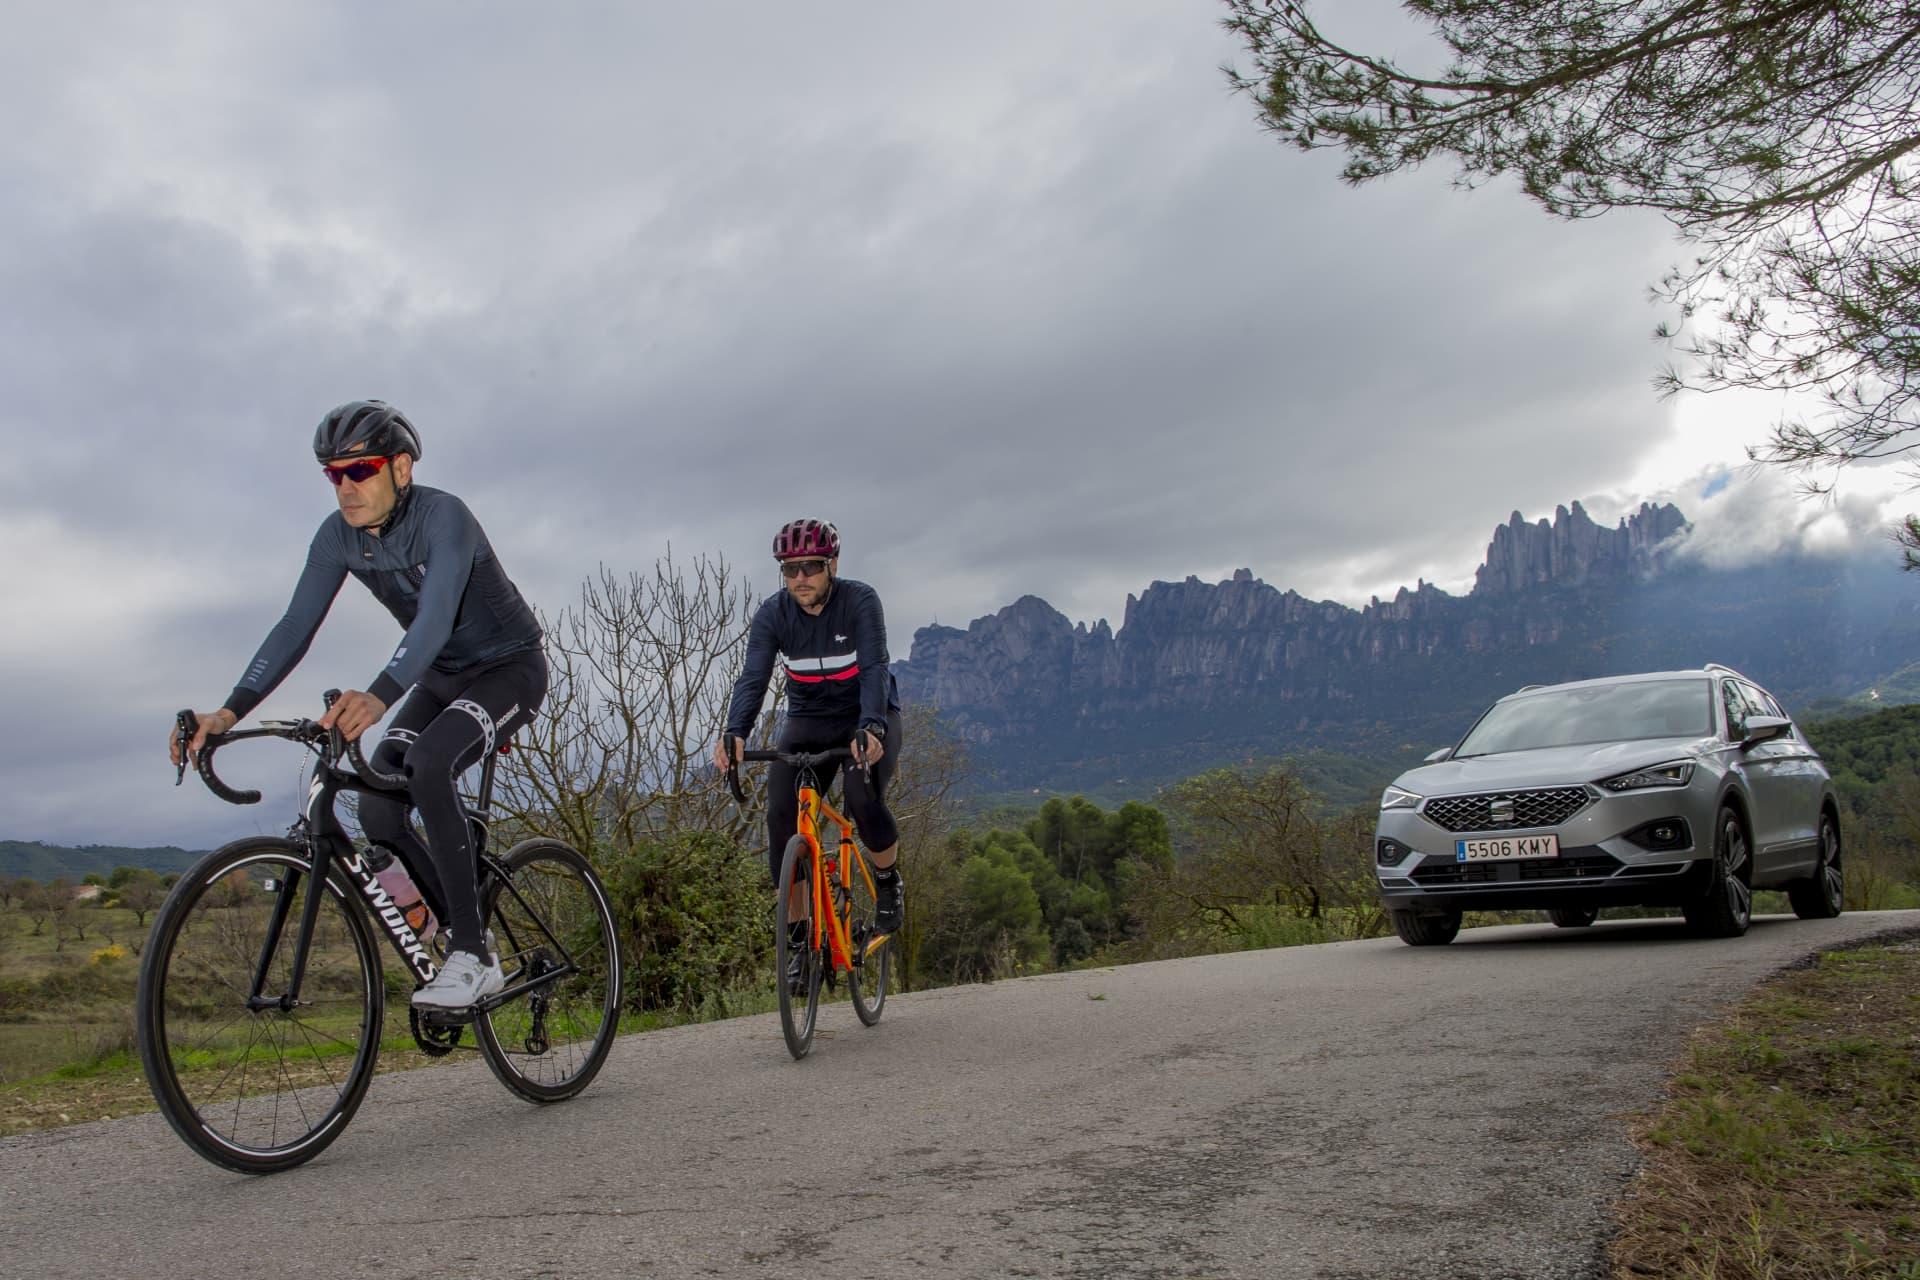 Adelantar Correctamente Ciclistas Biciletas 02